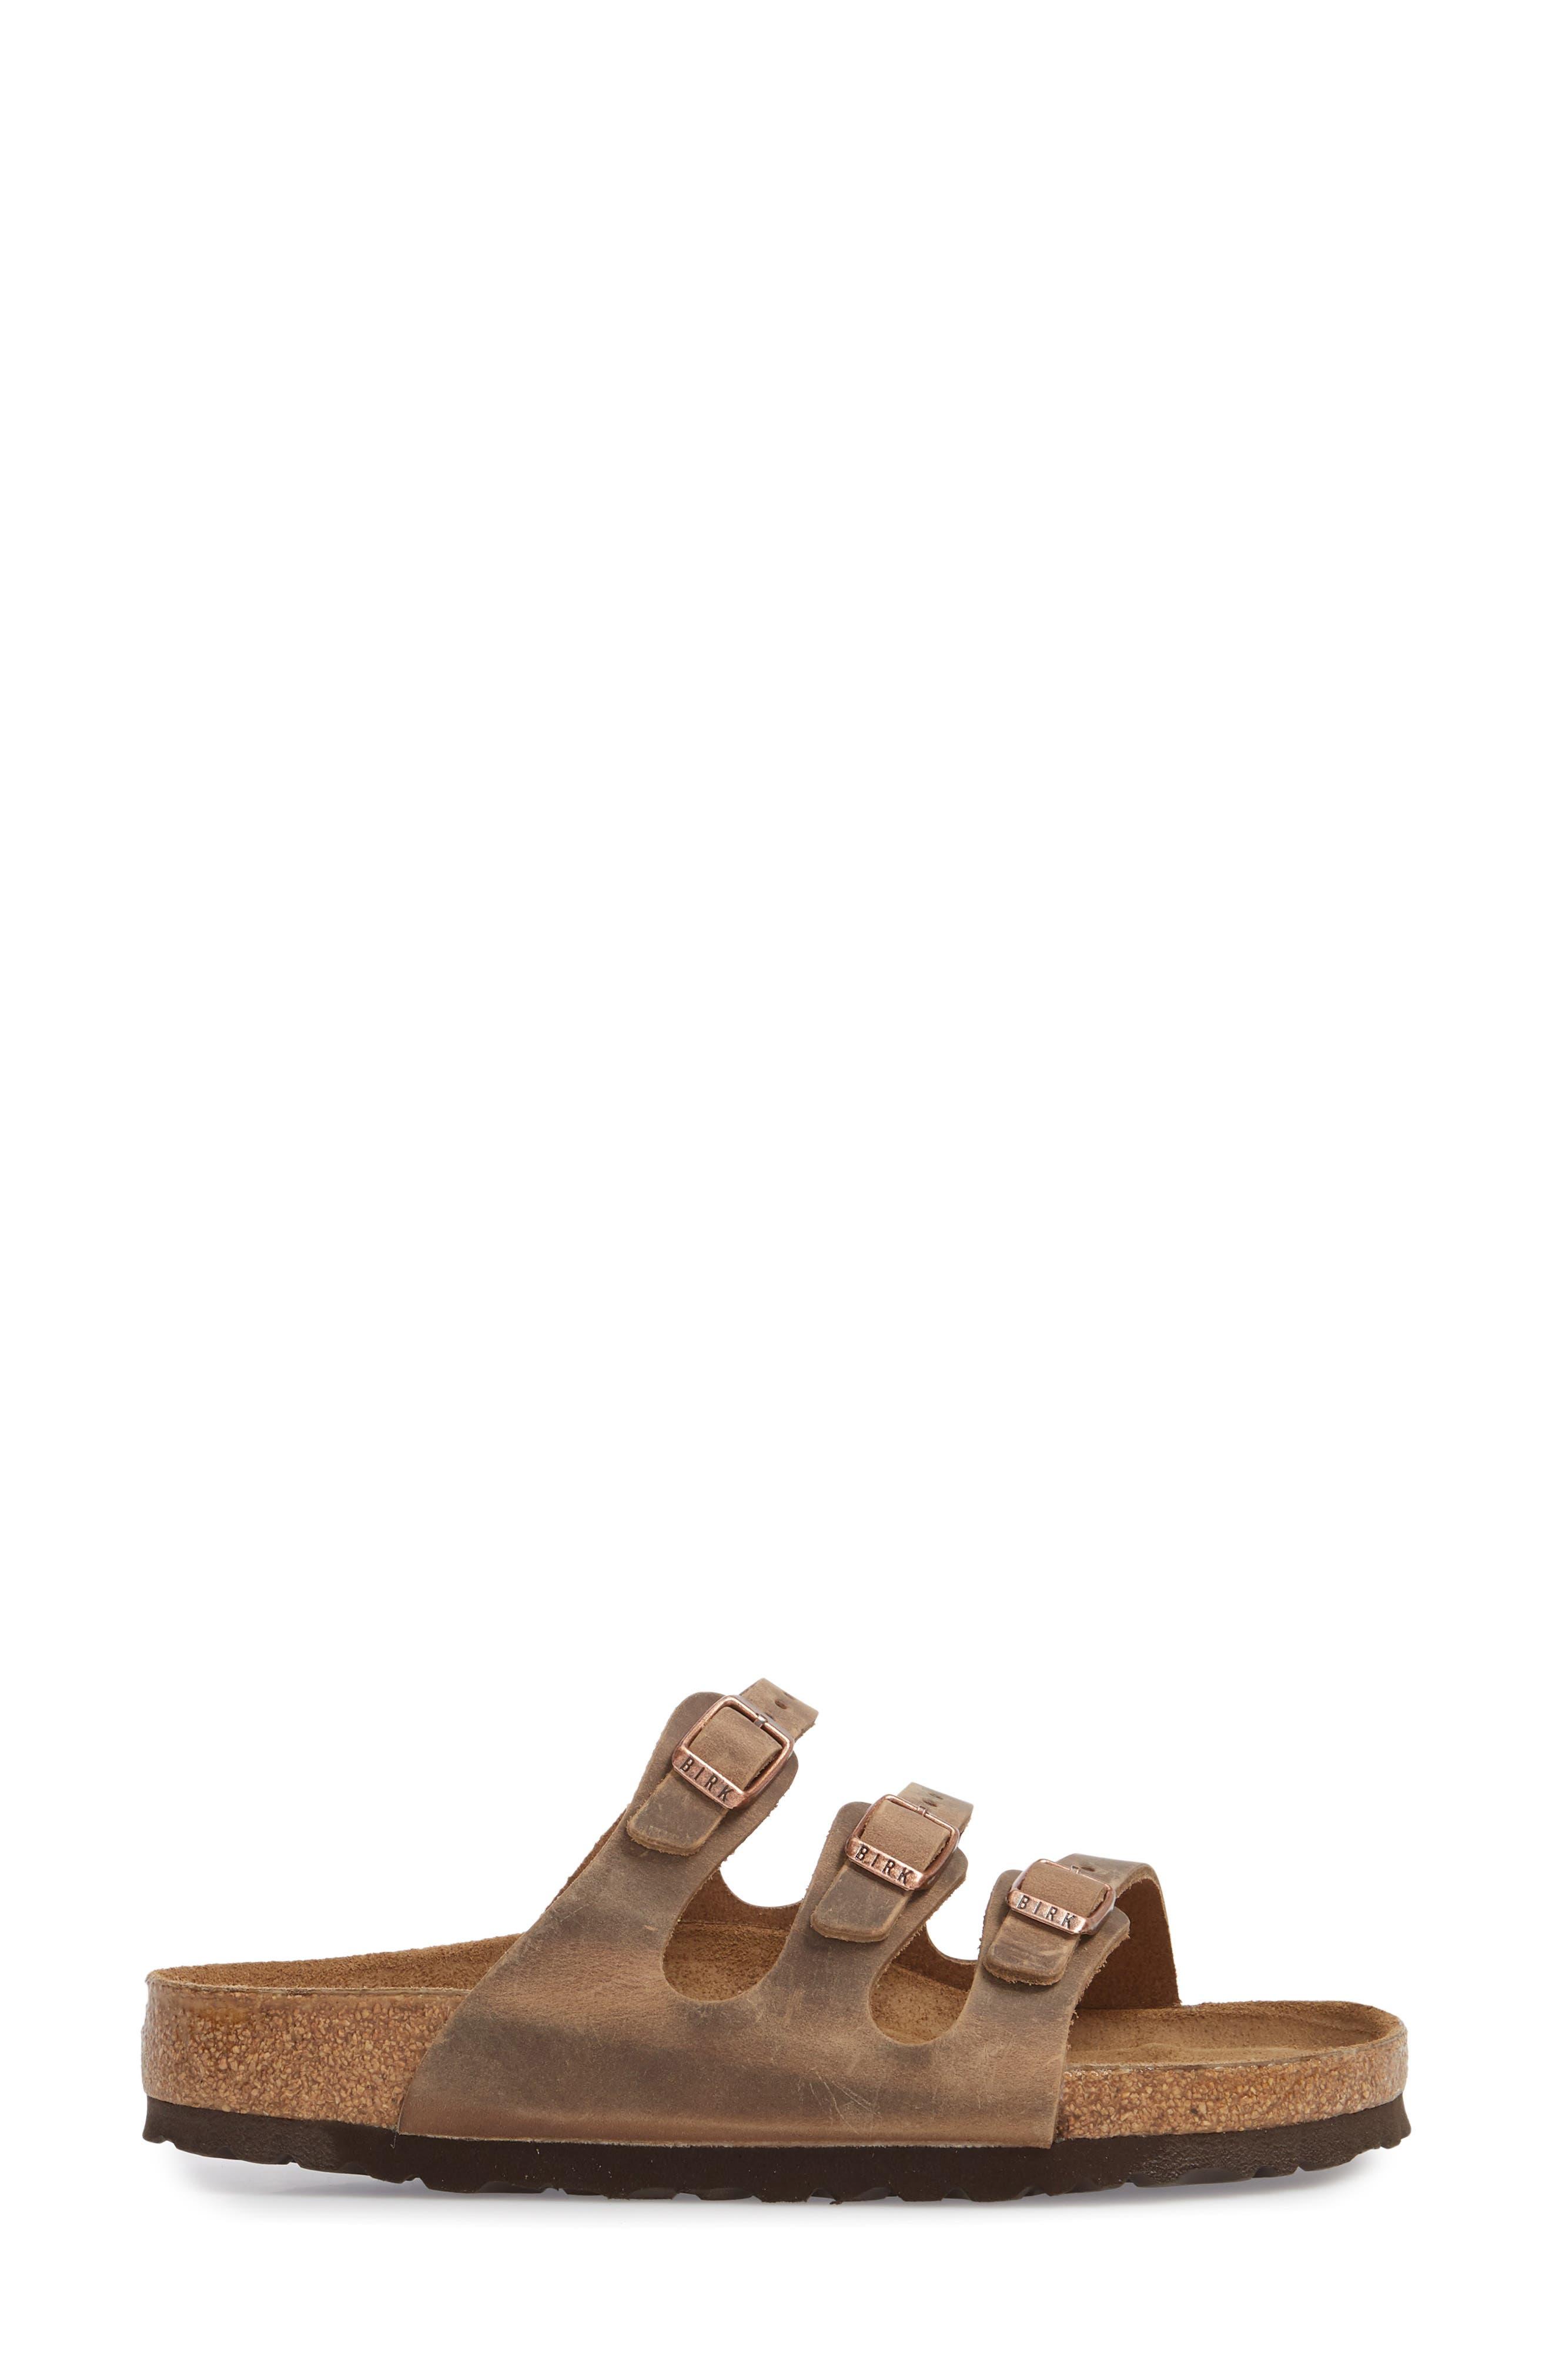 Florida Sandal,                             Alternate thumbnail 3, color,                             Tobacco Oiled Leather